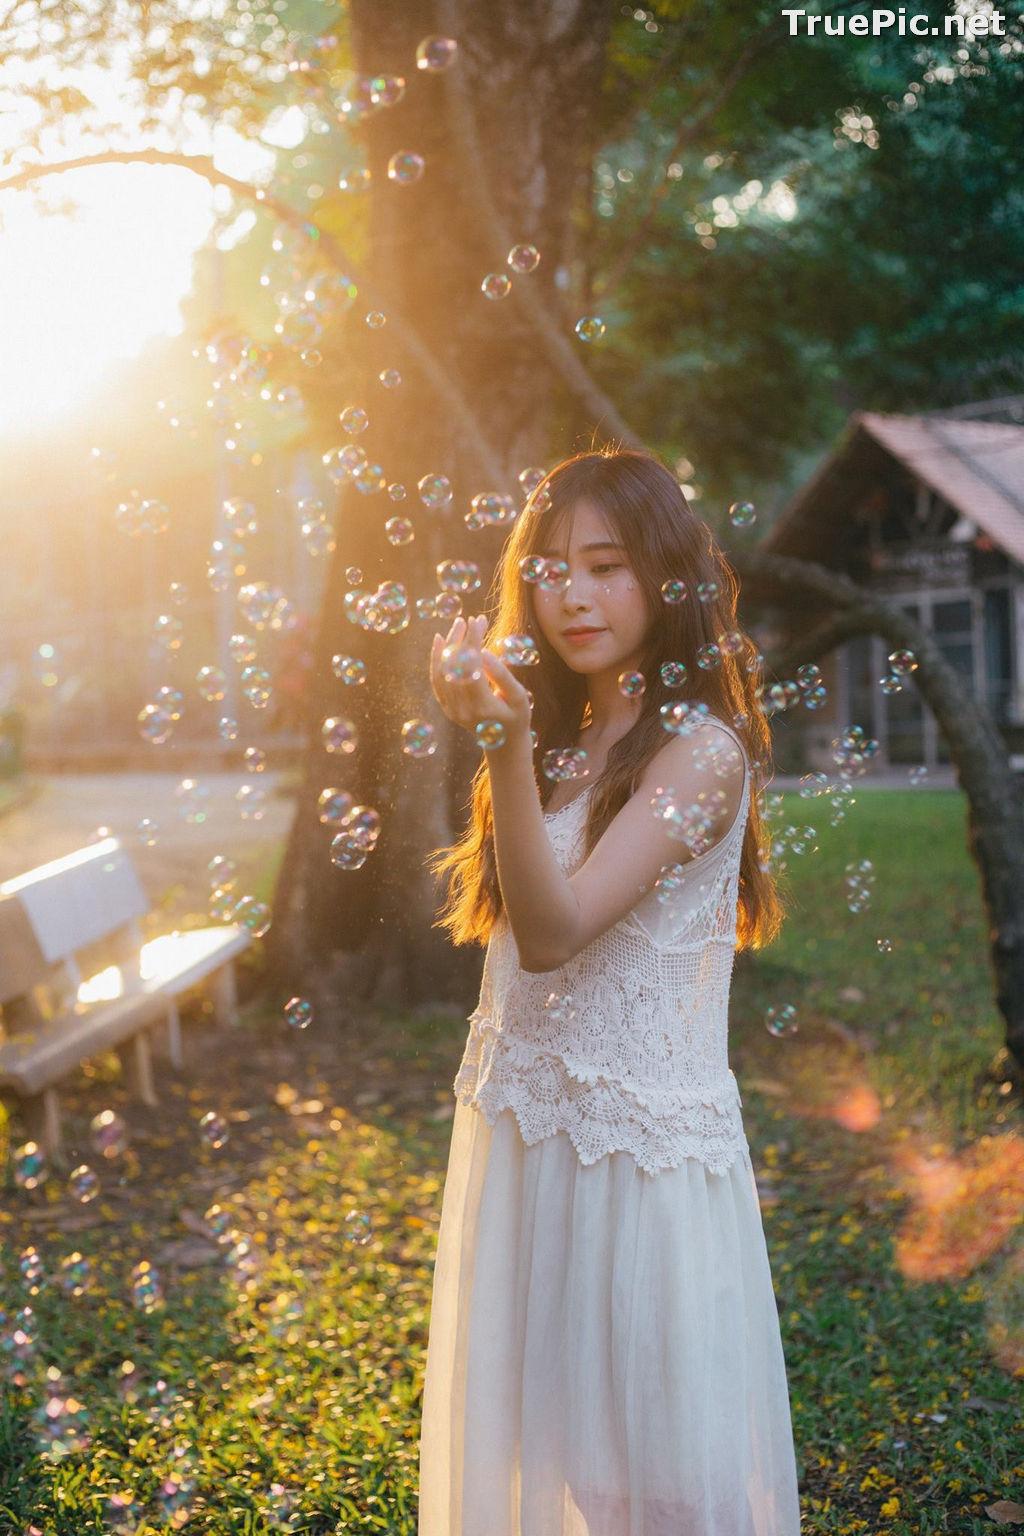 Image Vietnamese Model - Nguyen Phuong Dung - Hot Girls Ads - TruePic.net - Picture-7